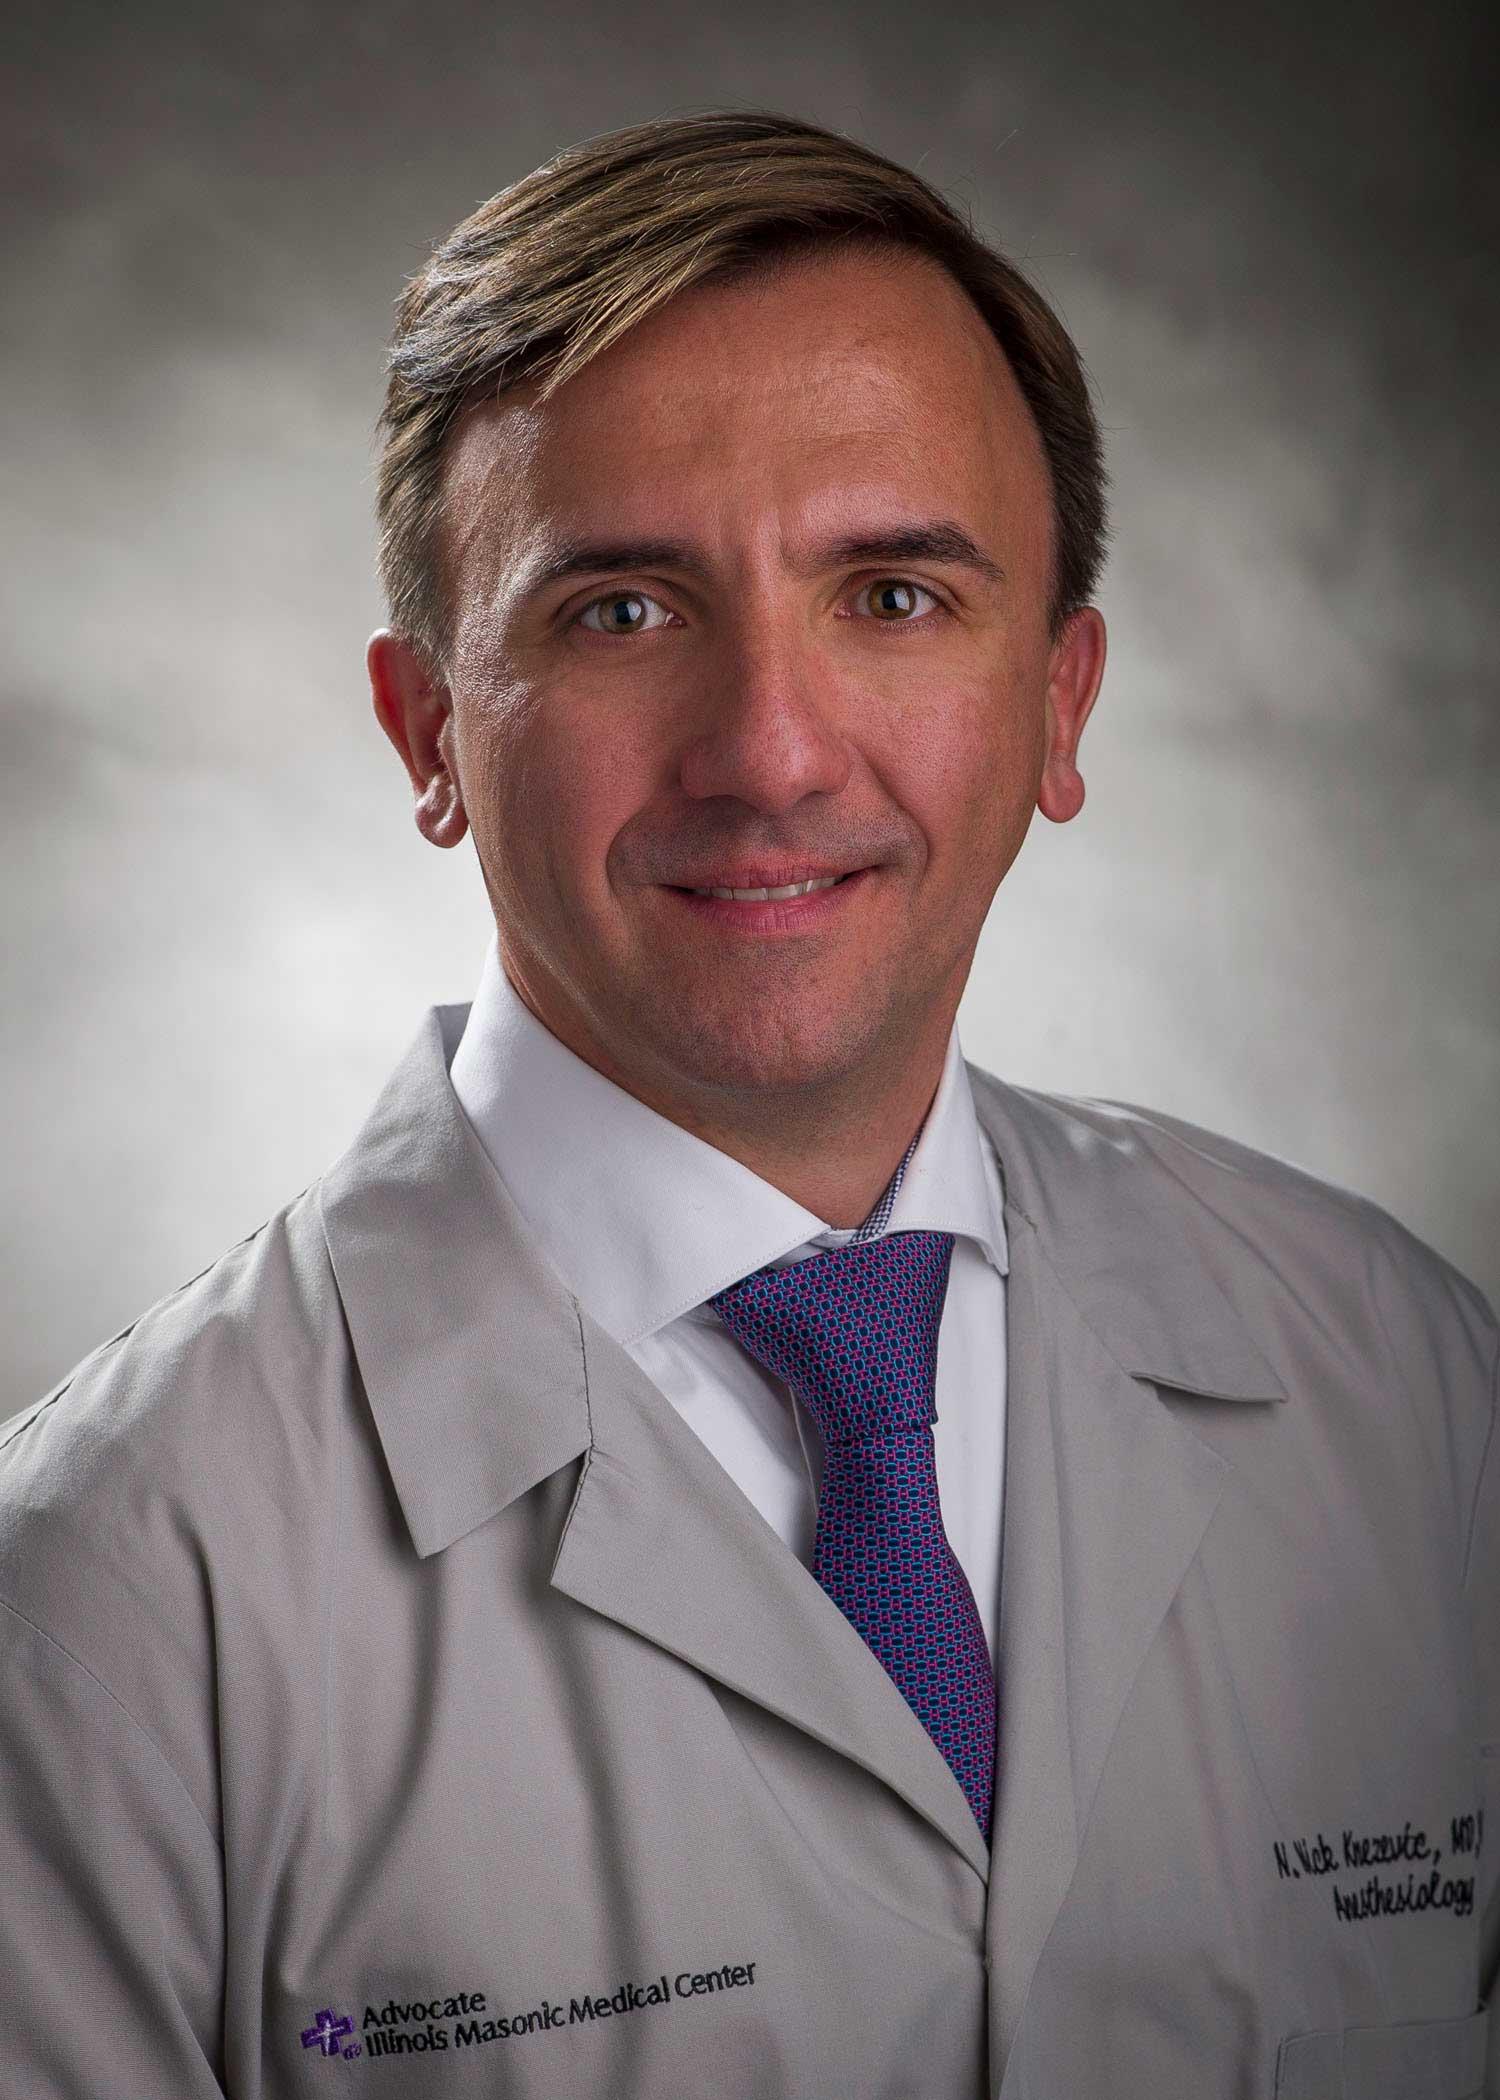 Nick Knezevic, M.D., PhD